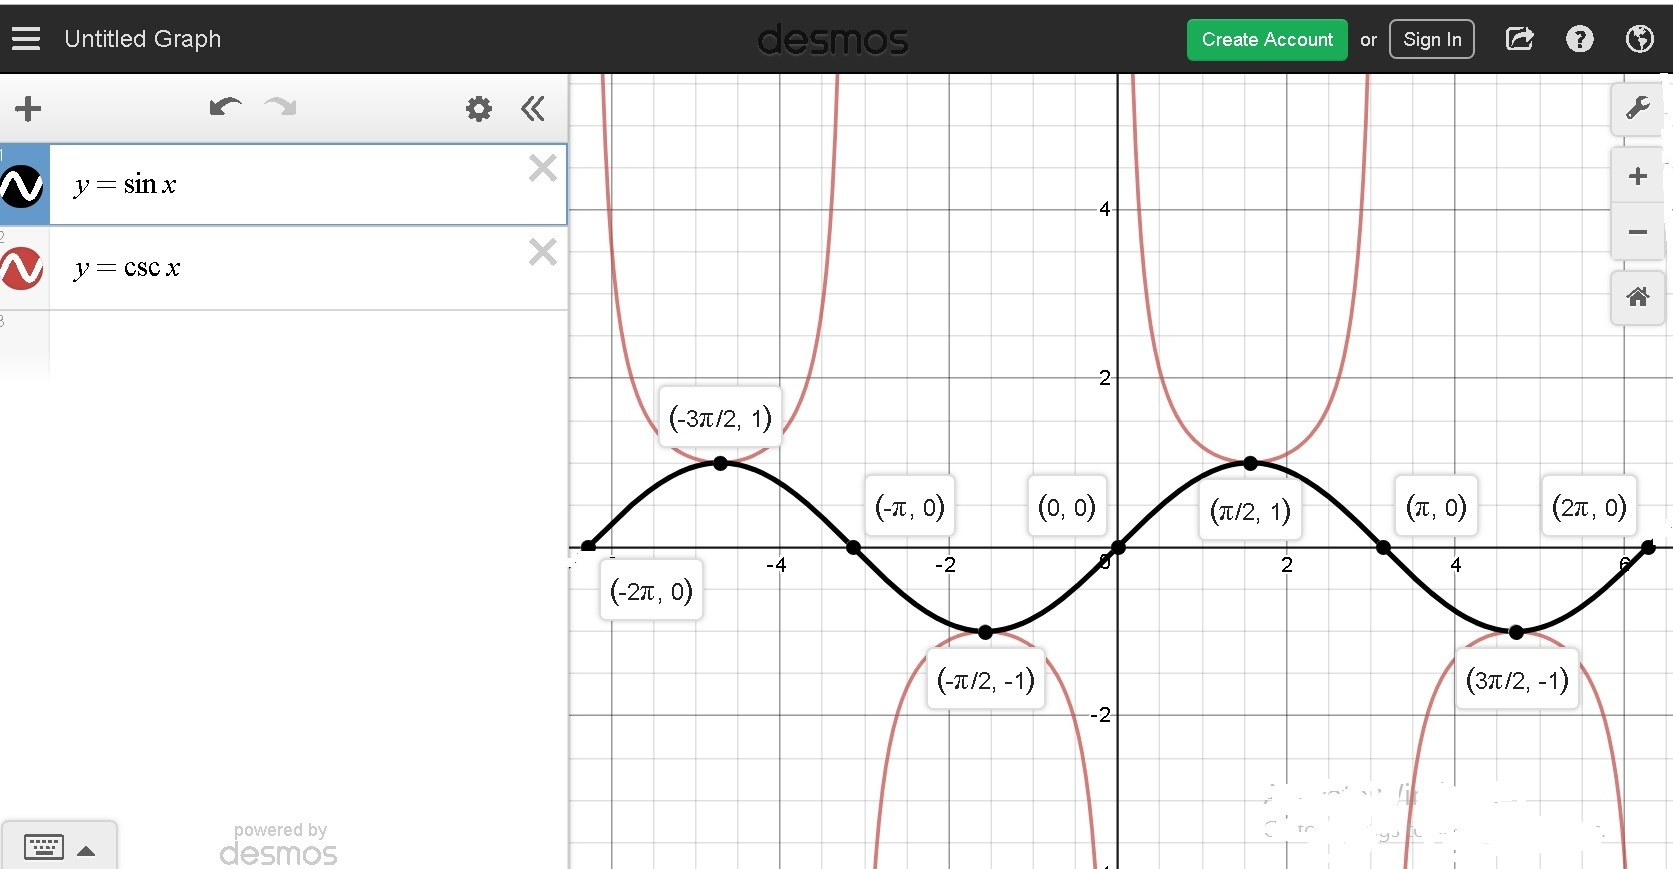 What are the graphs of y = sin x and y = csc x in the